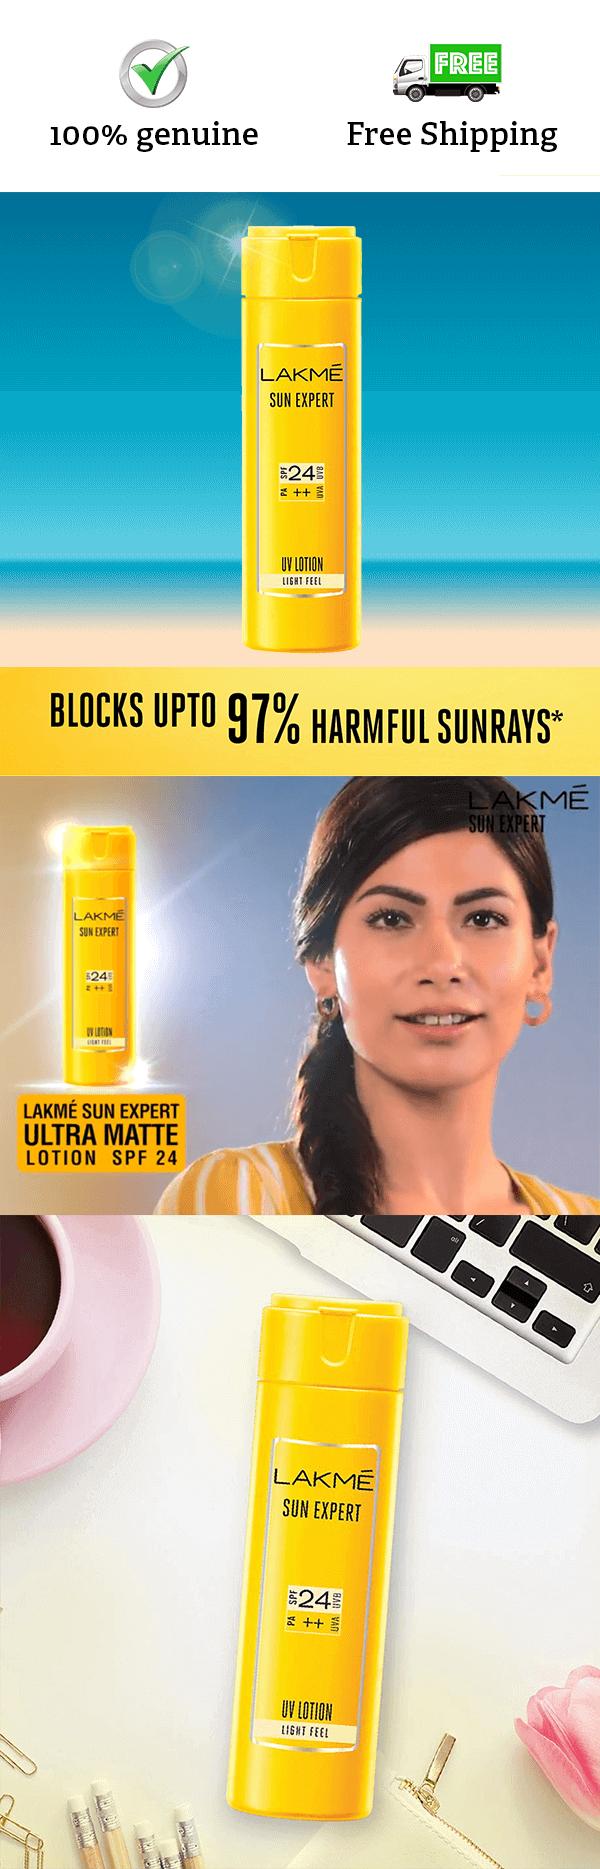 Lakme Sunscreen